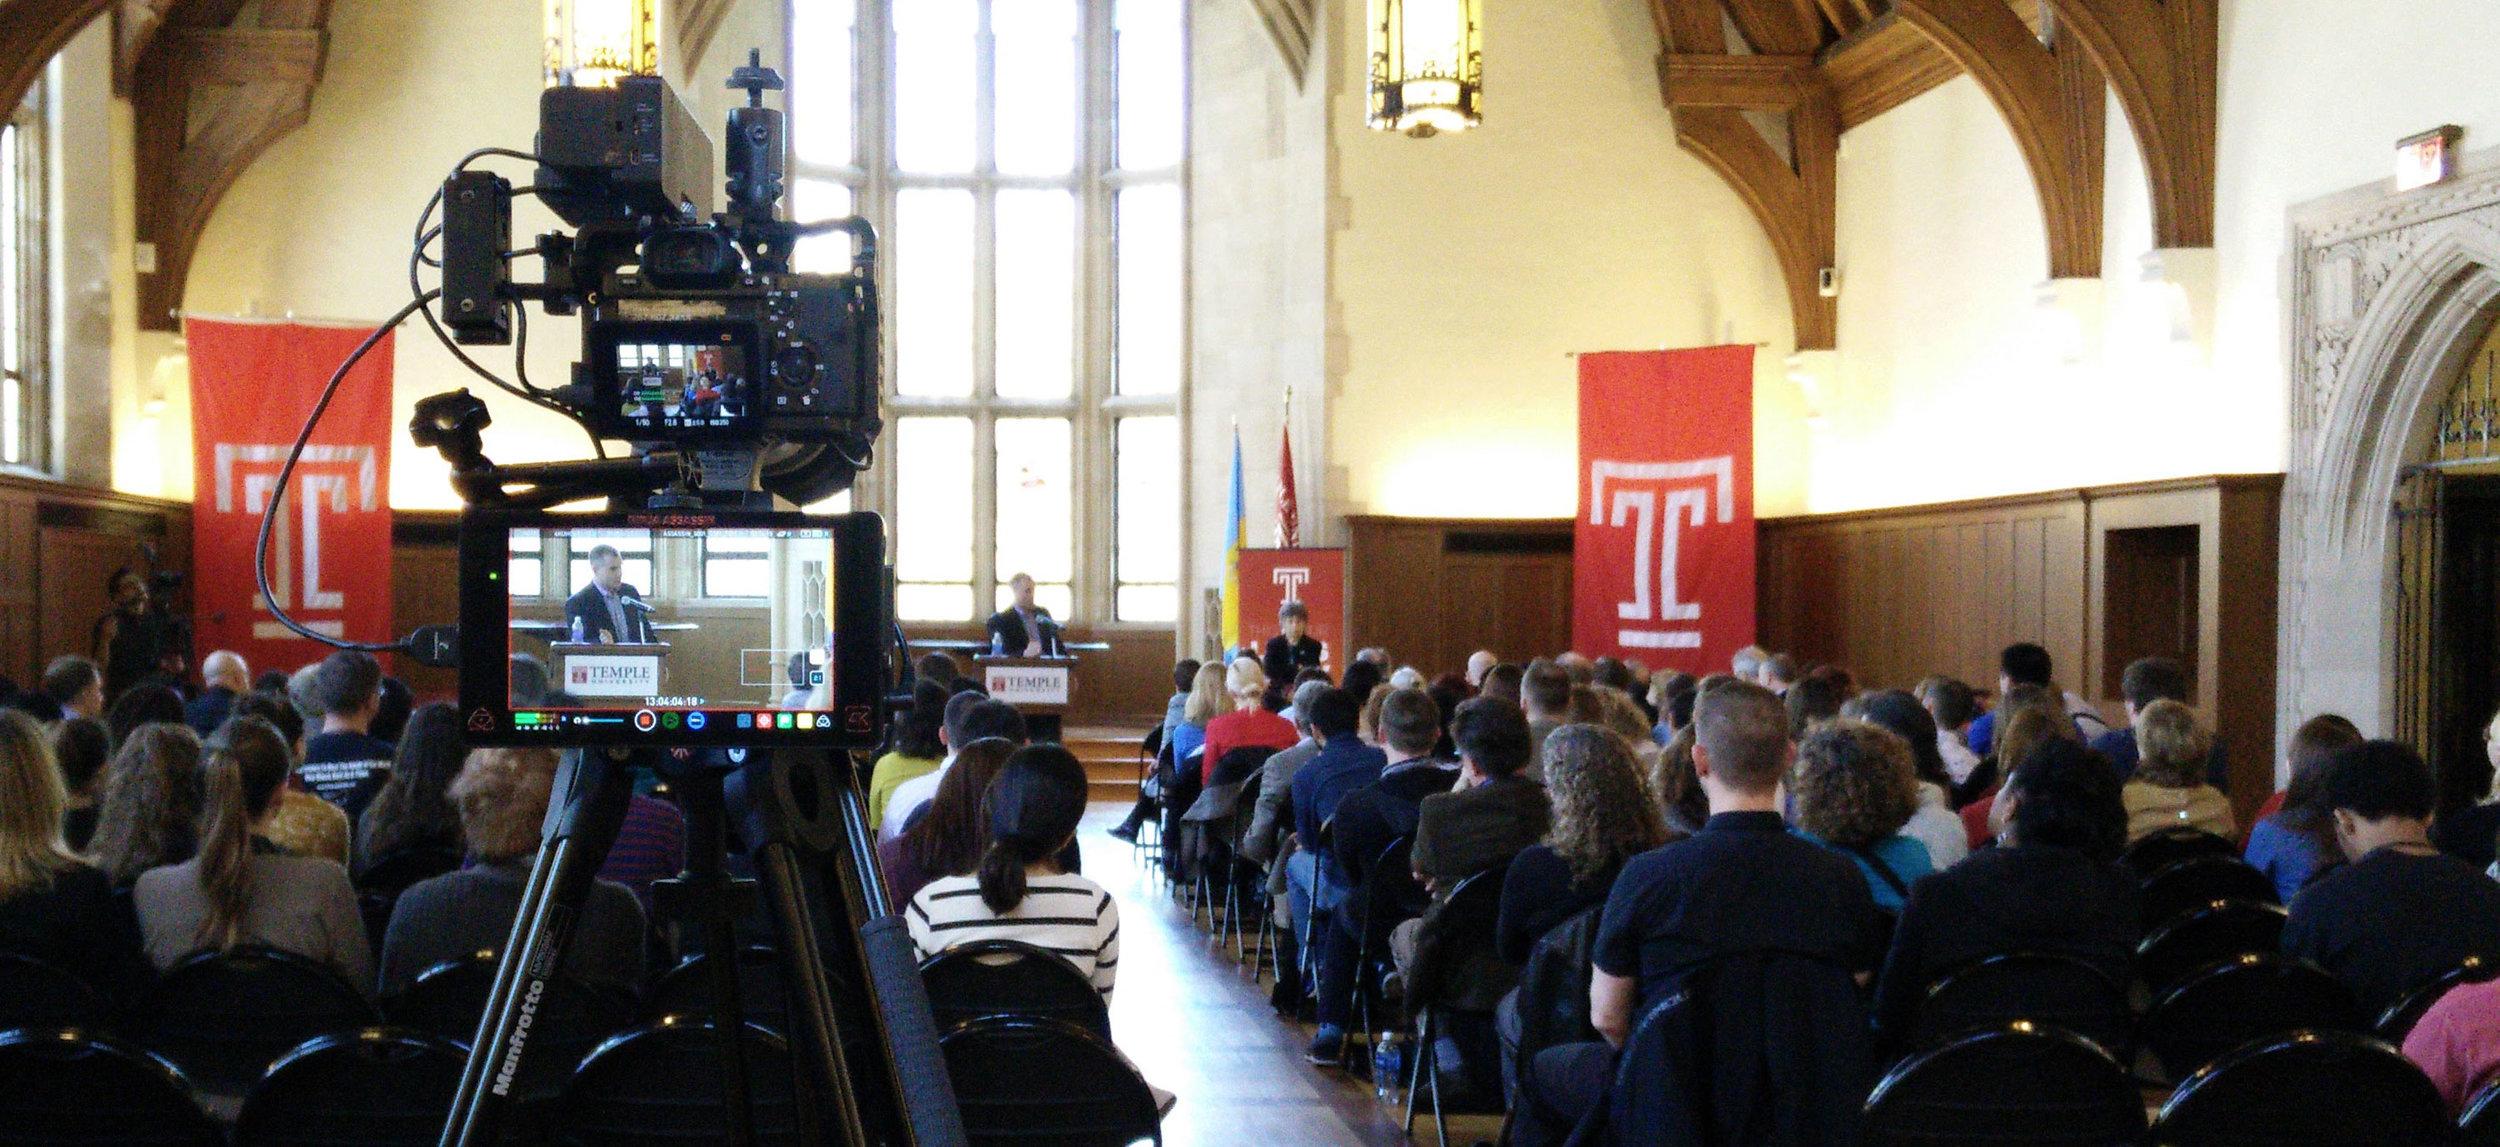 NYT columnist Frank Bruni gives a talk at Temple's Sullivan Hall